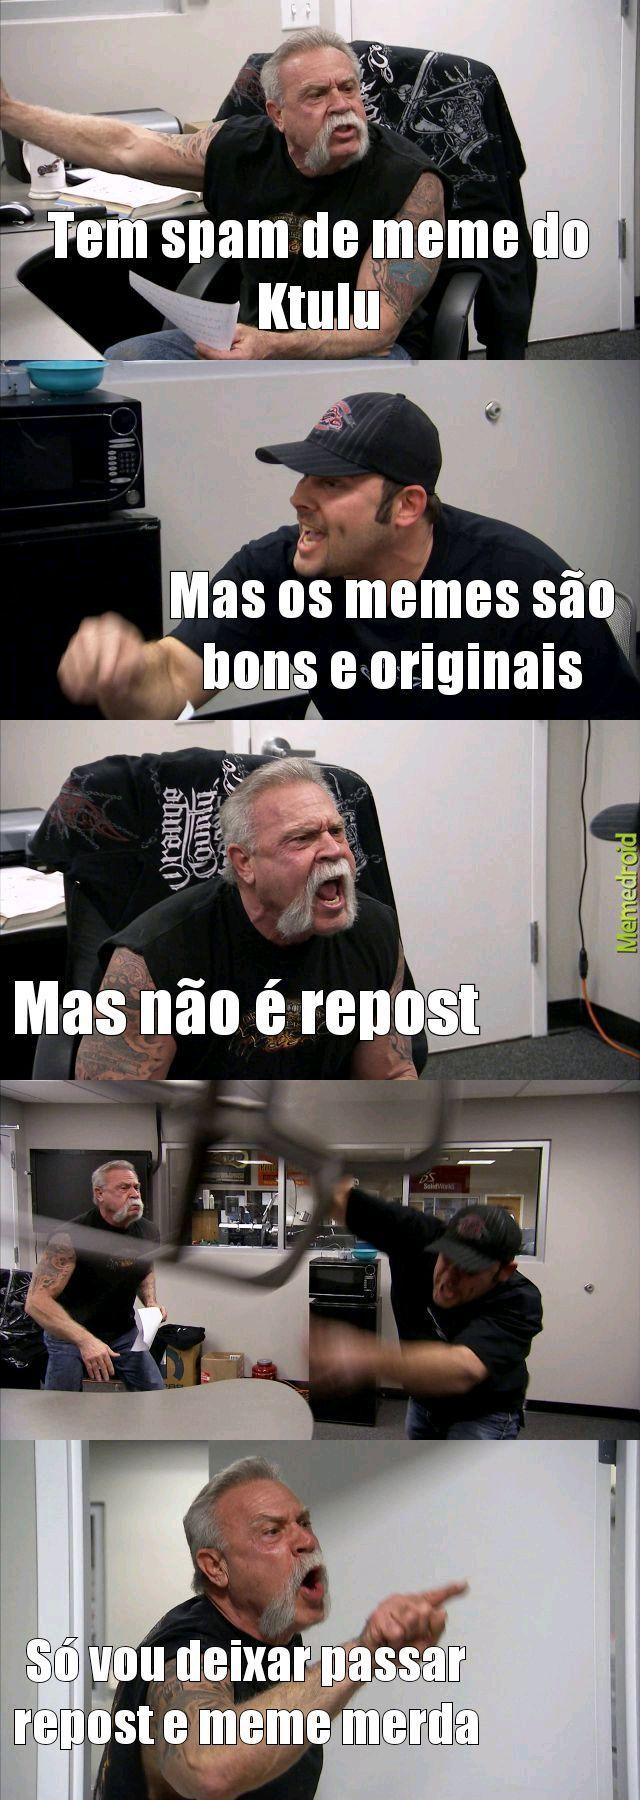 Iä iä cthulhu fhtagn - meme